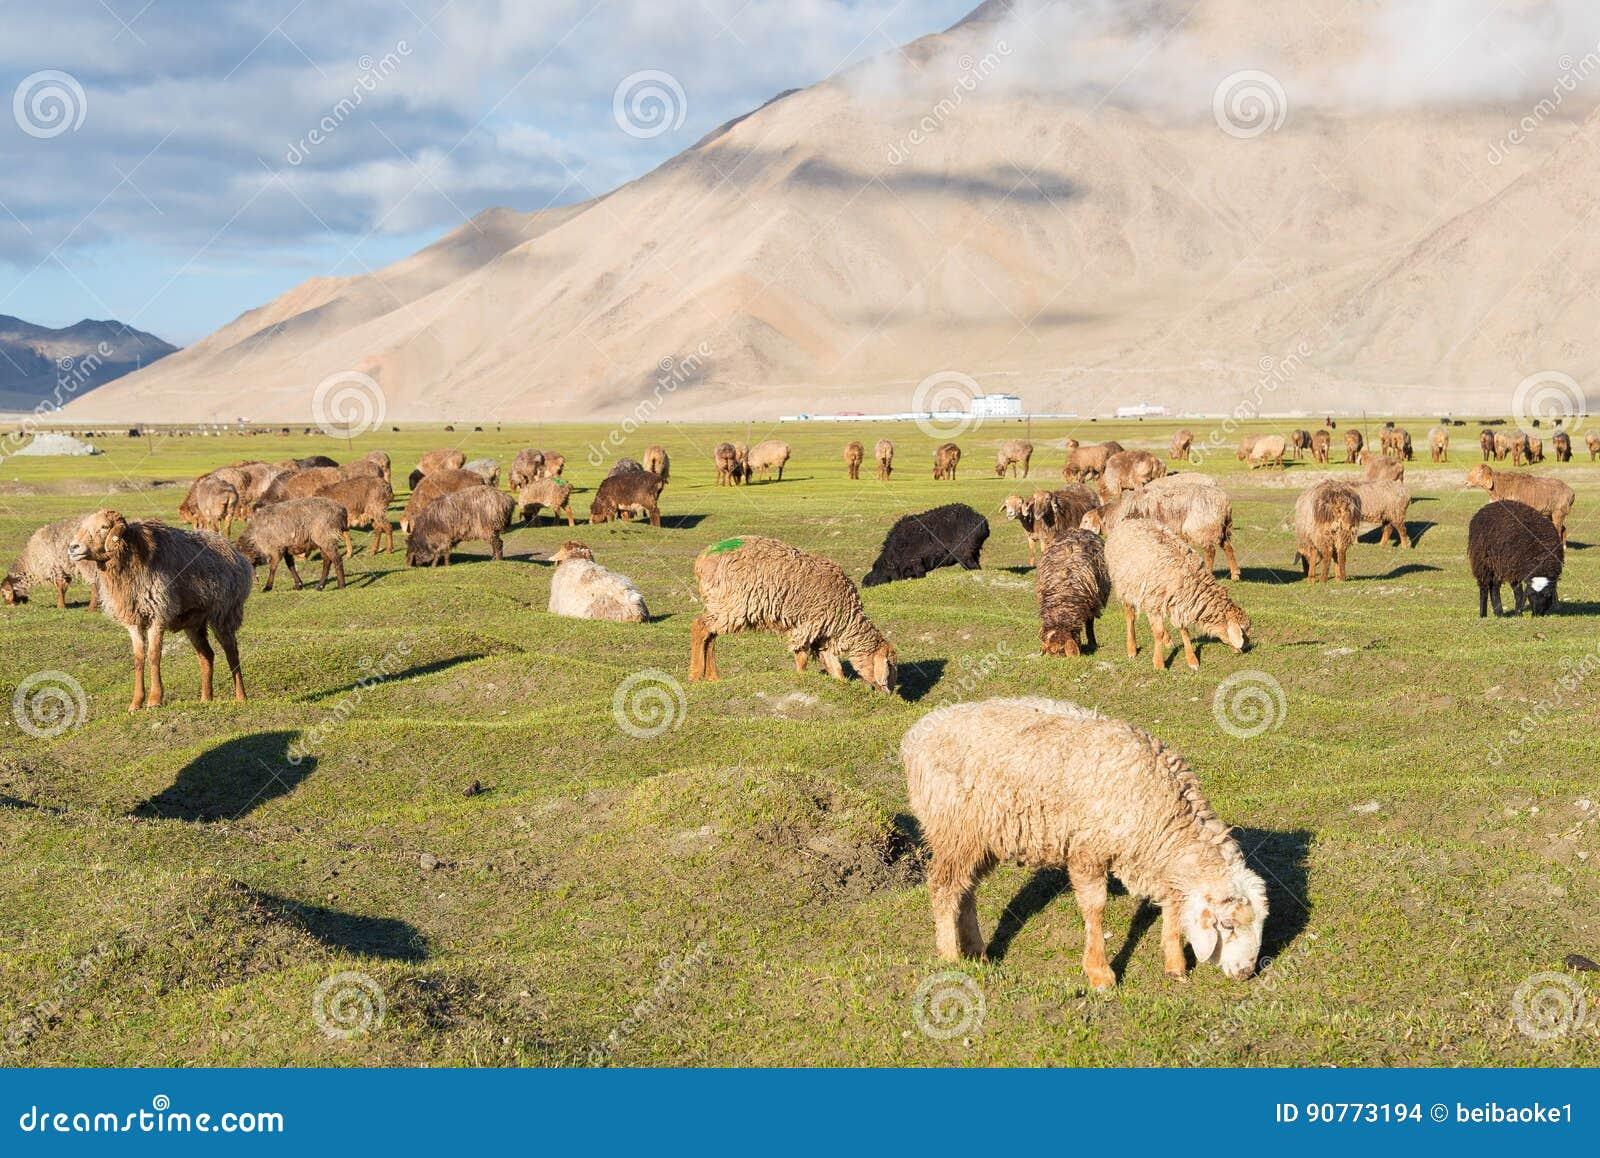 XINJIANG, CINA - 21 maggio 2015: Pecore nel lago karakul una l famosa